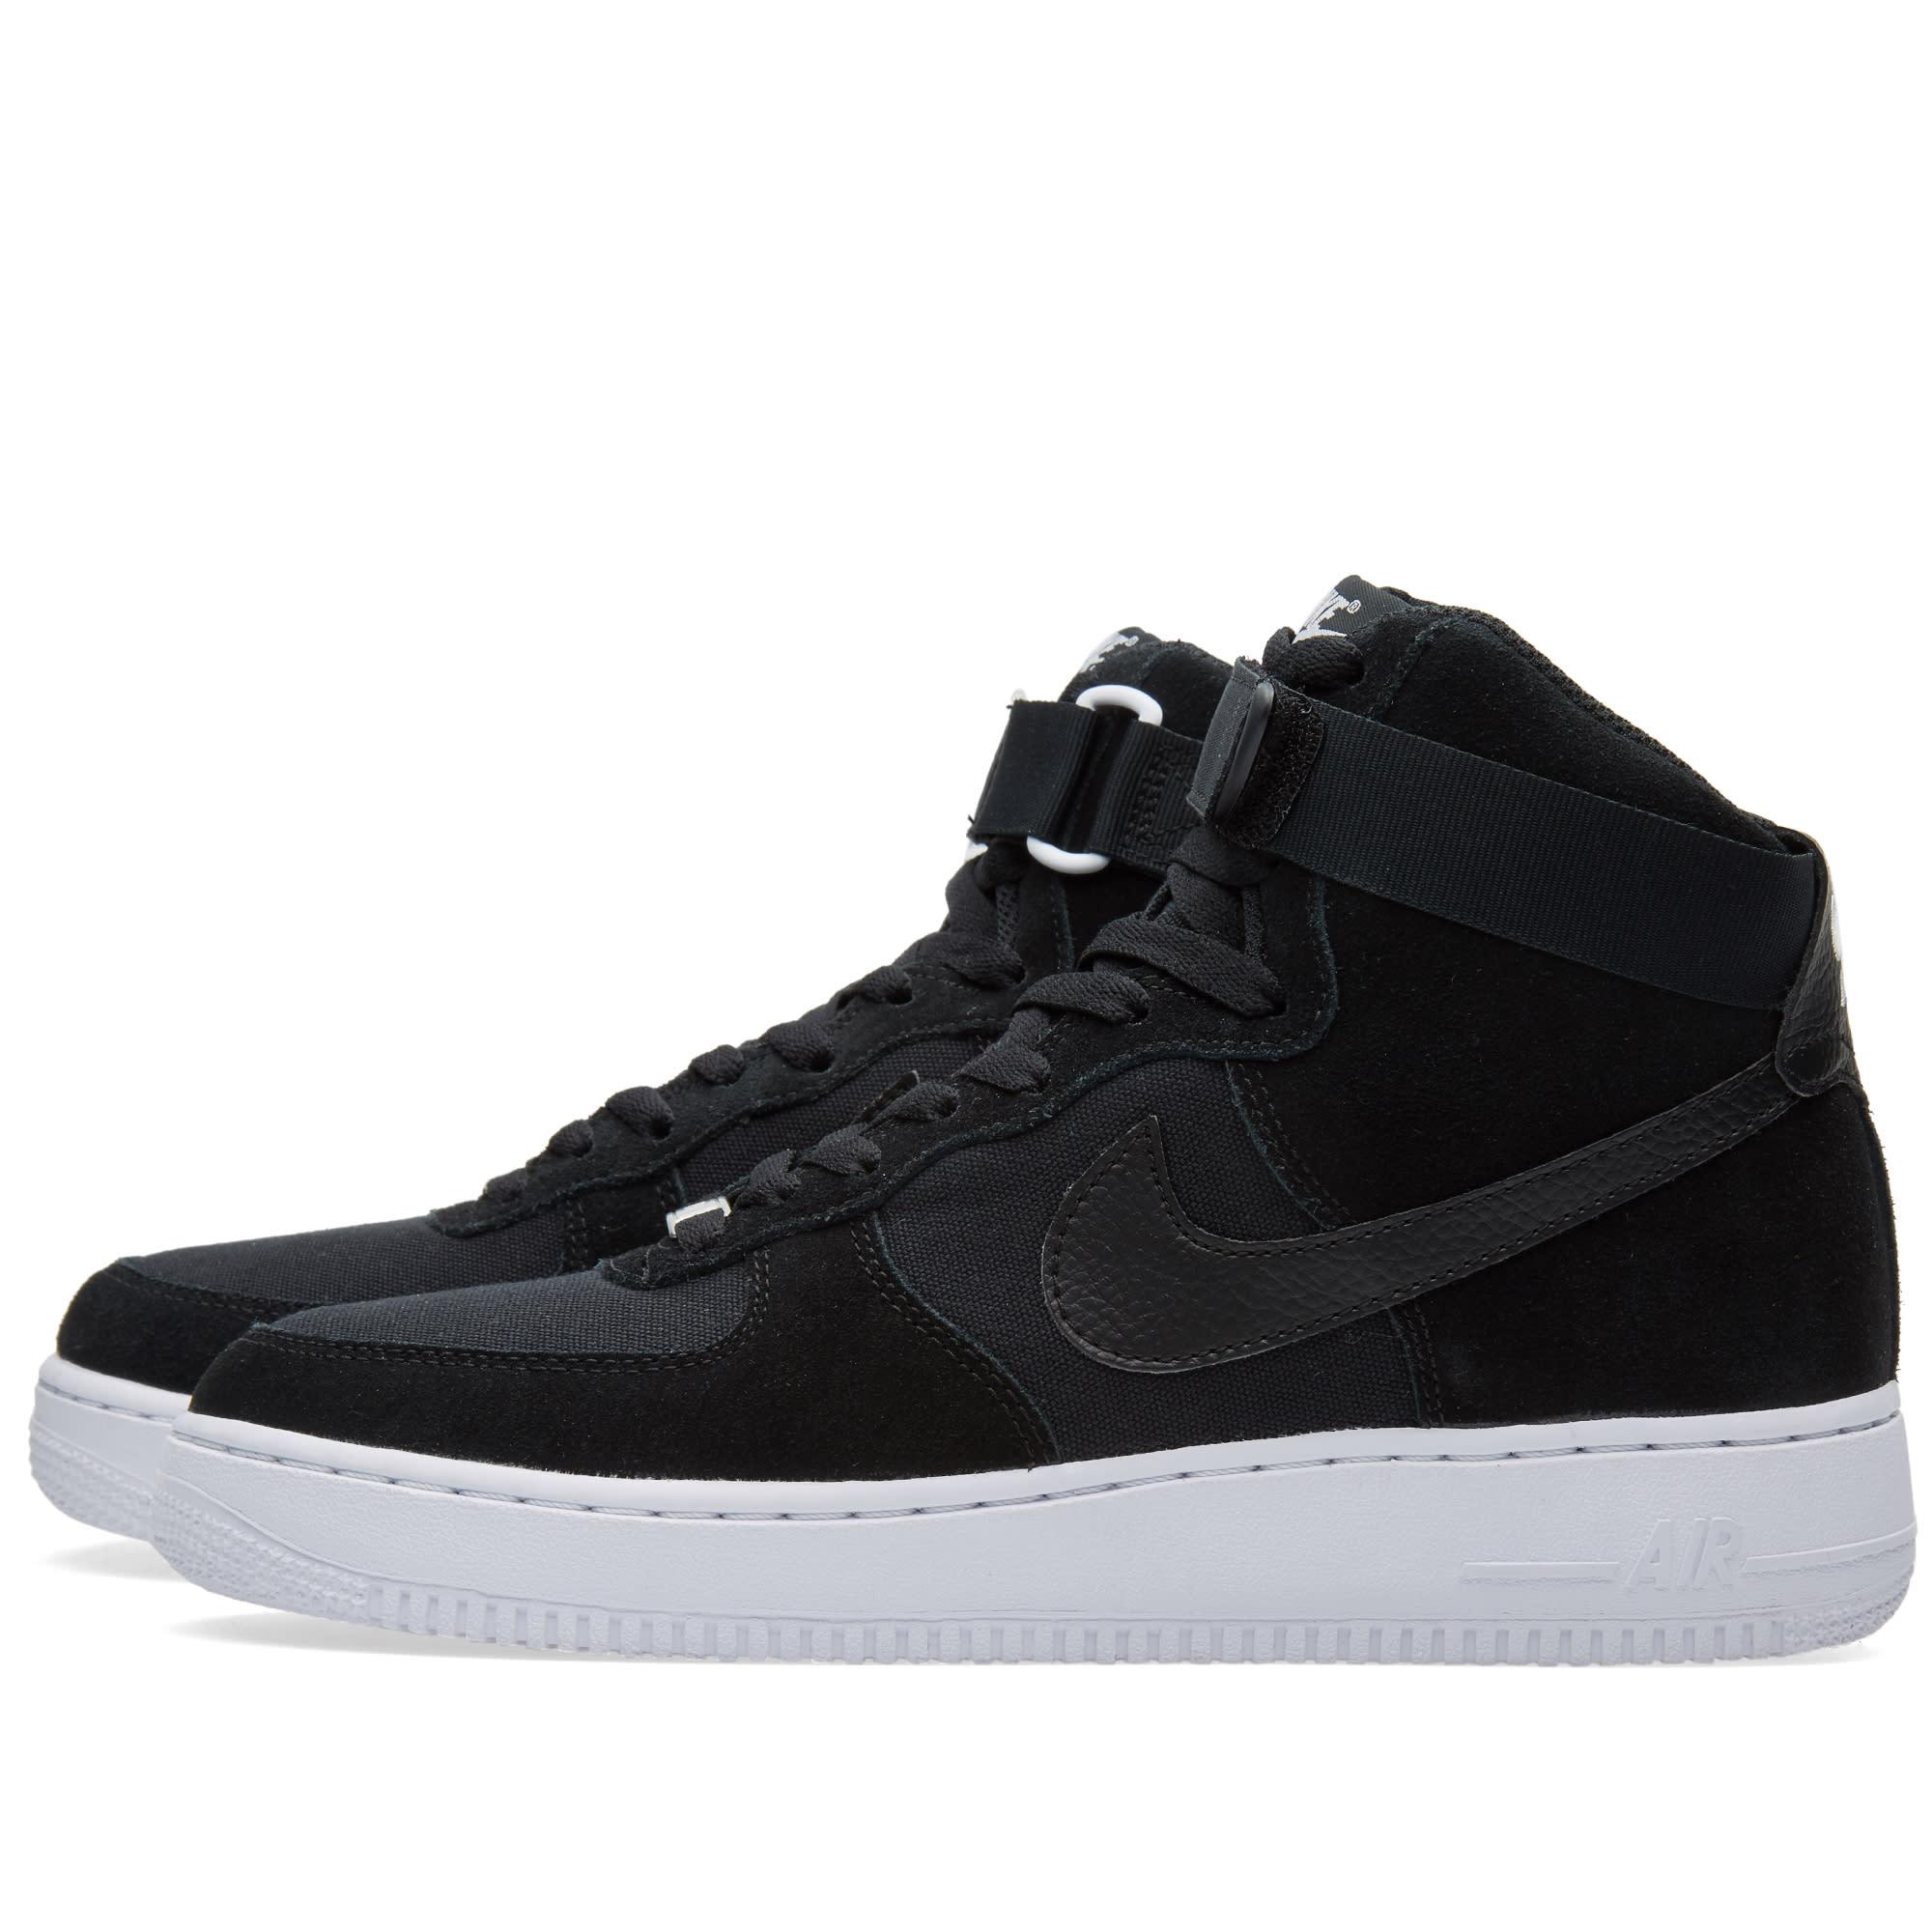 online store 3881e f1a0a Nike Air Force 1 High '07